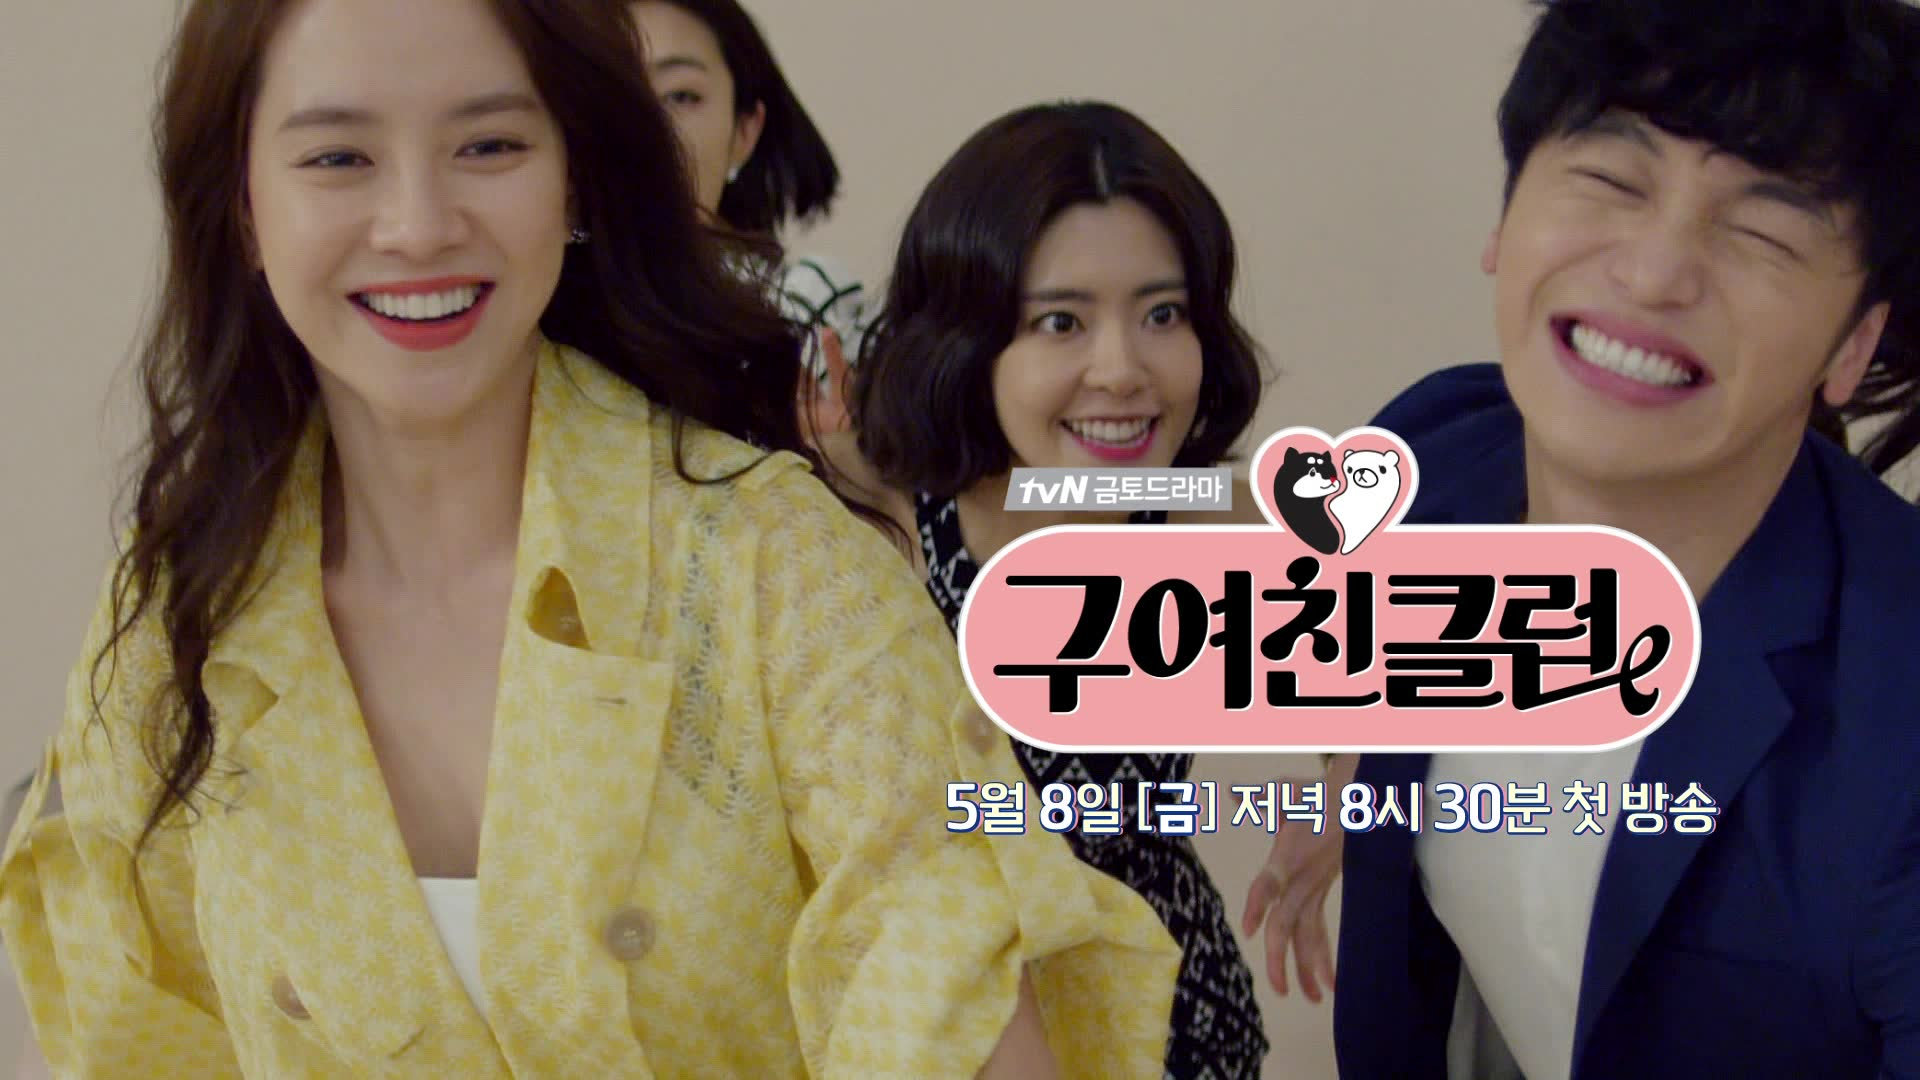 Teaser 1 (15s): Ex-Girlfriend Club